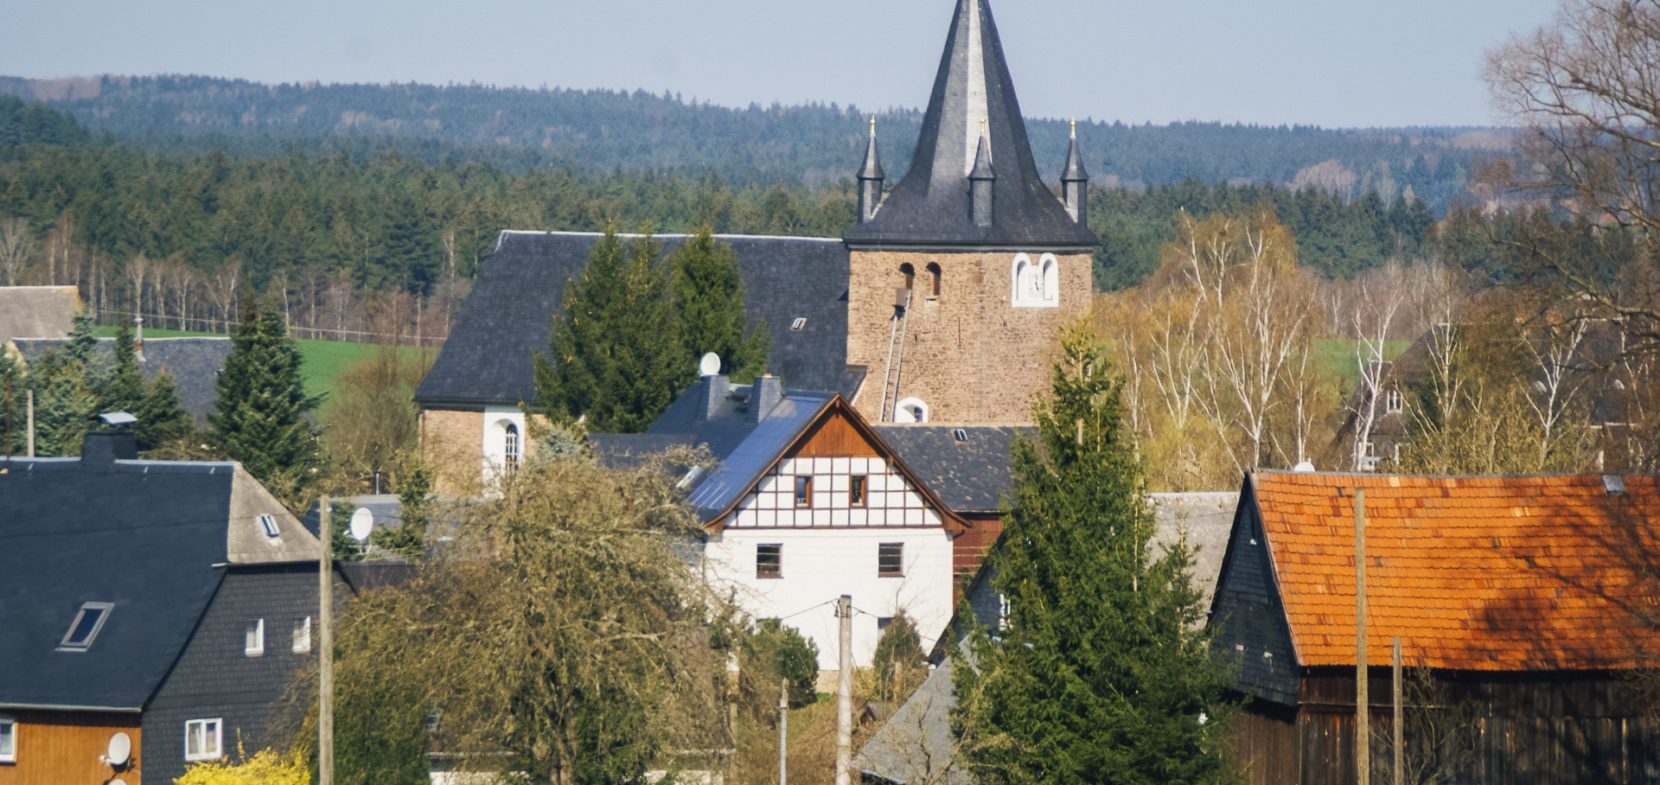 Marienkirche zu Stangengrün